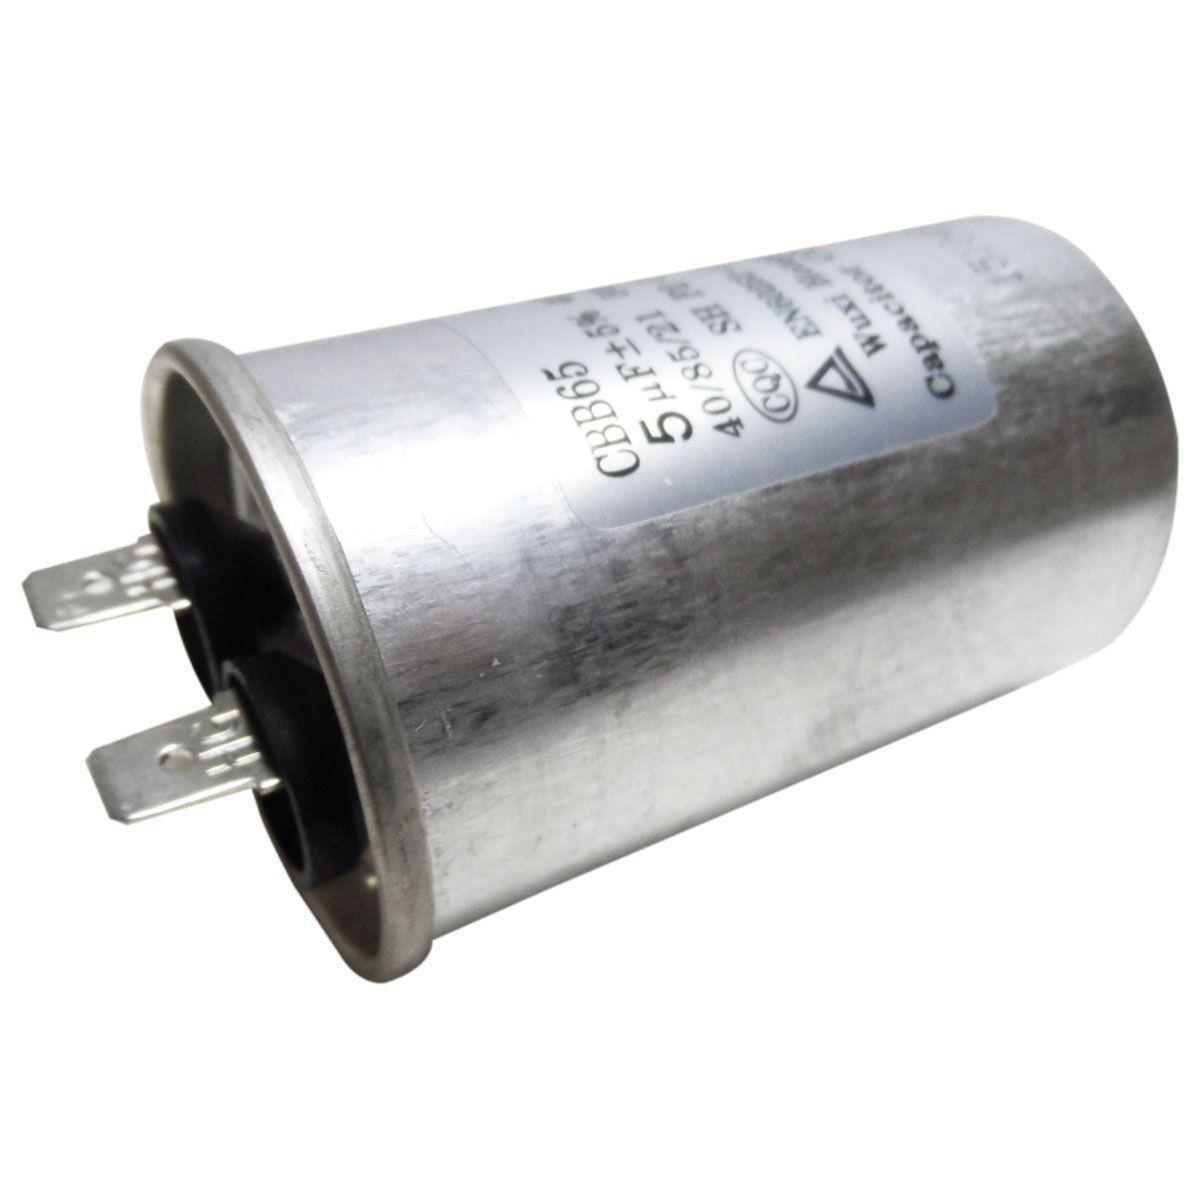 Capacitor 220V STR10/ST10 30030080